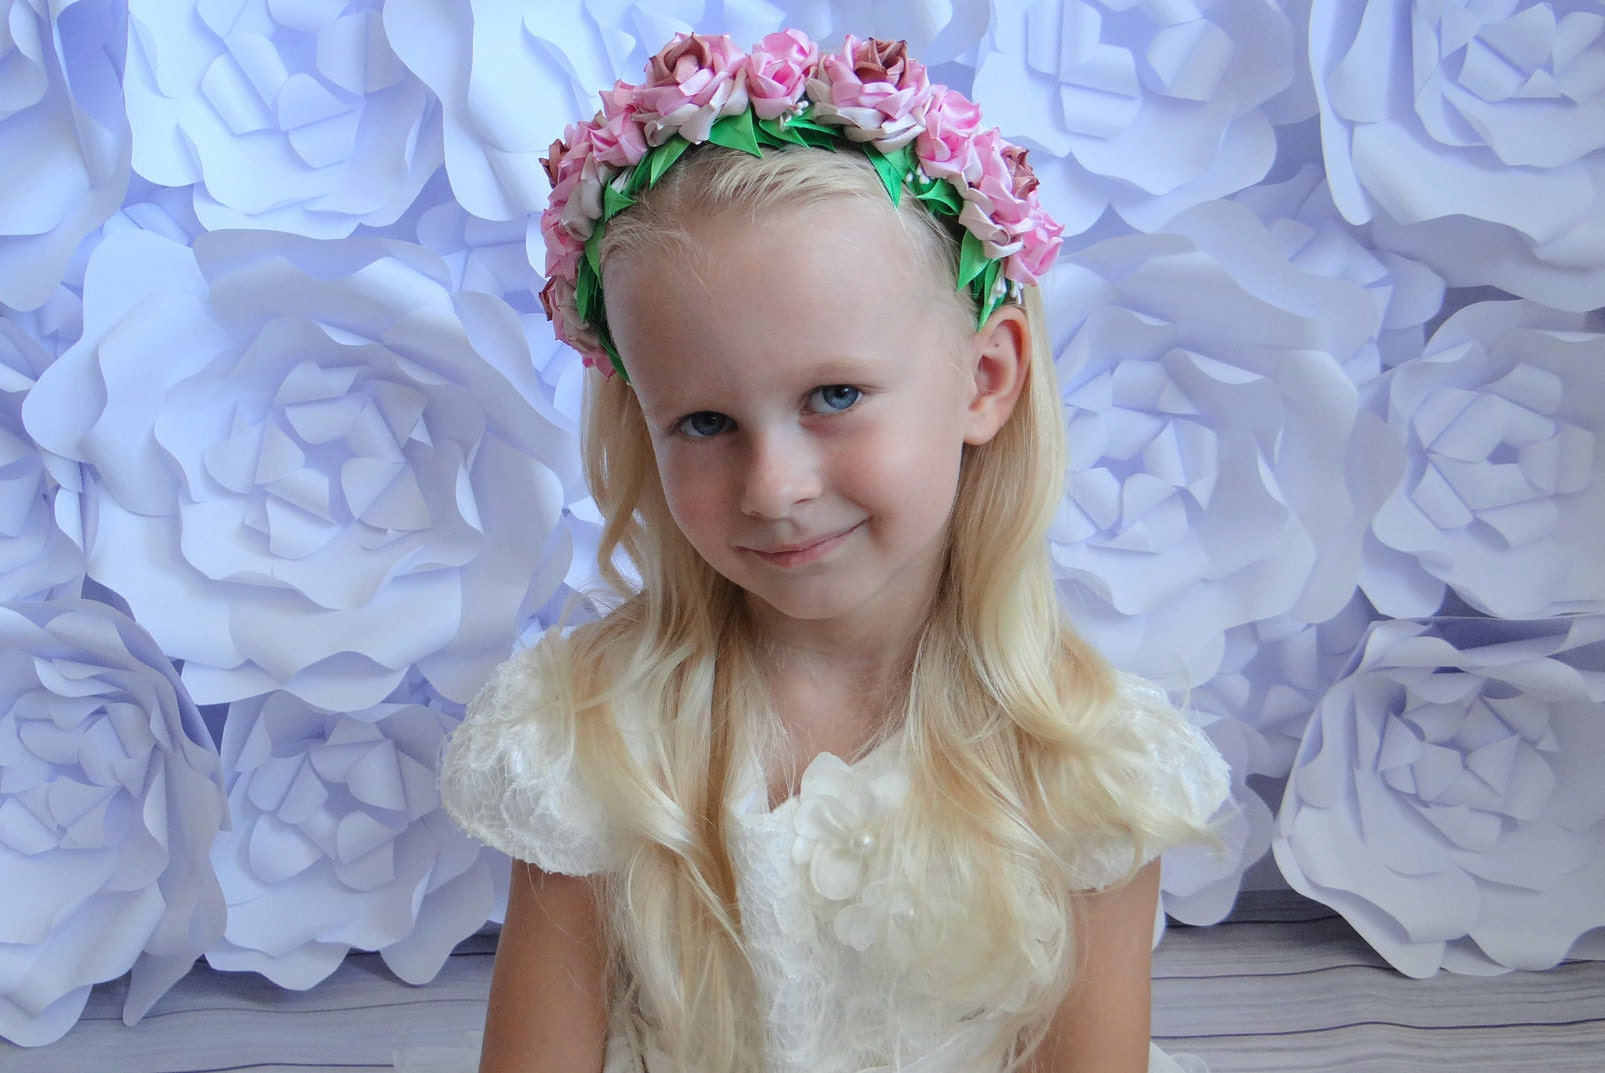 Hair Accessories Headbands Baby Headbands Girls Headbands Infant